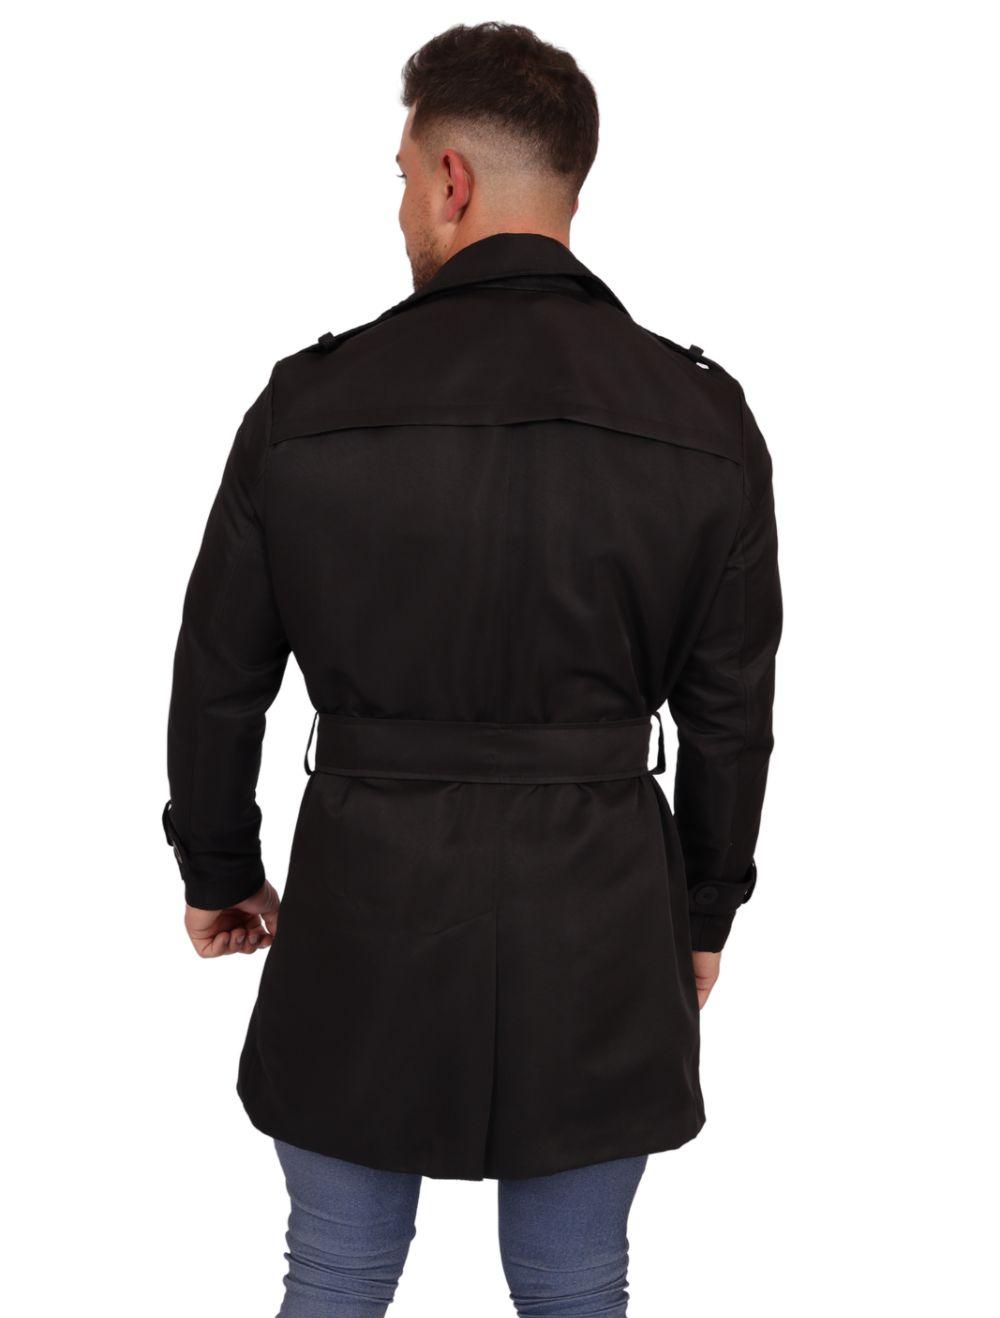 Casaco Masculino Capa Trench Coat Slim Preto